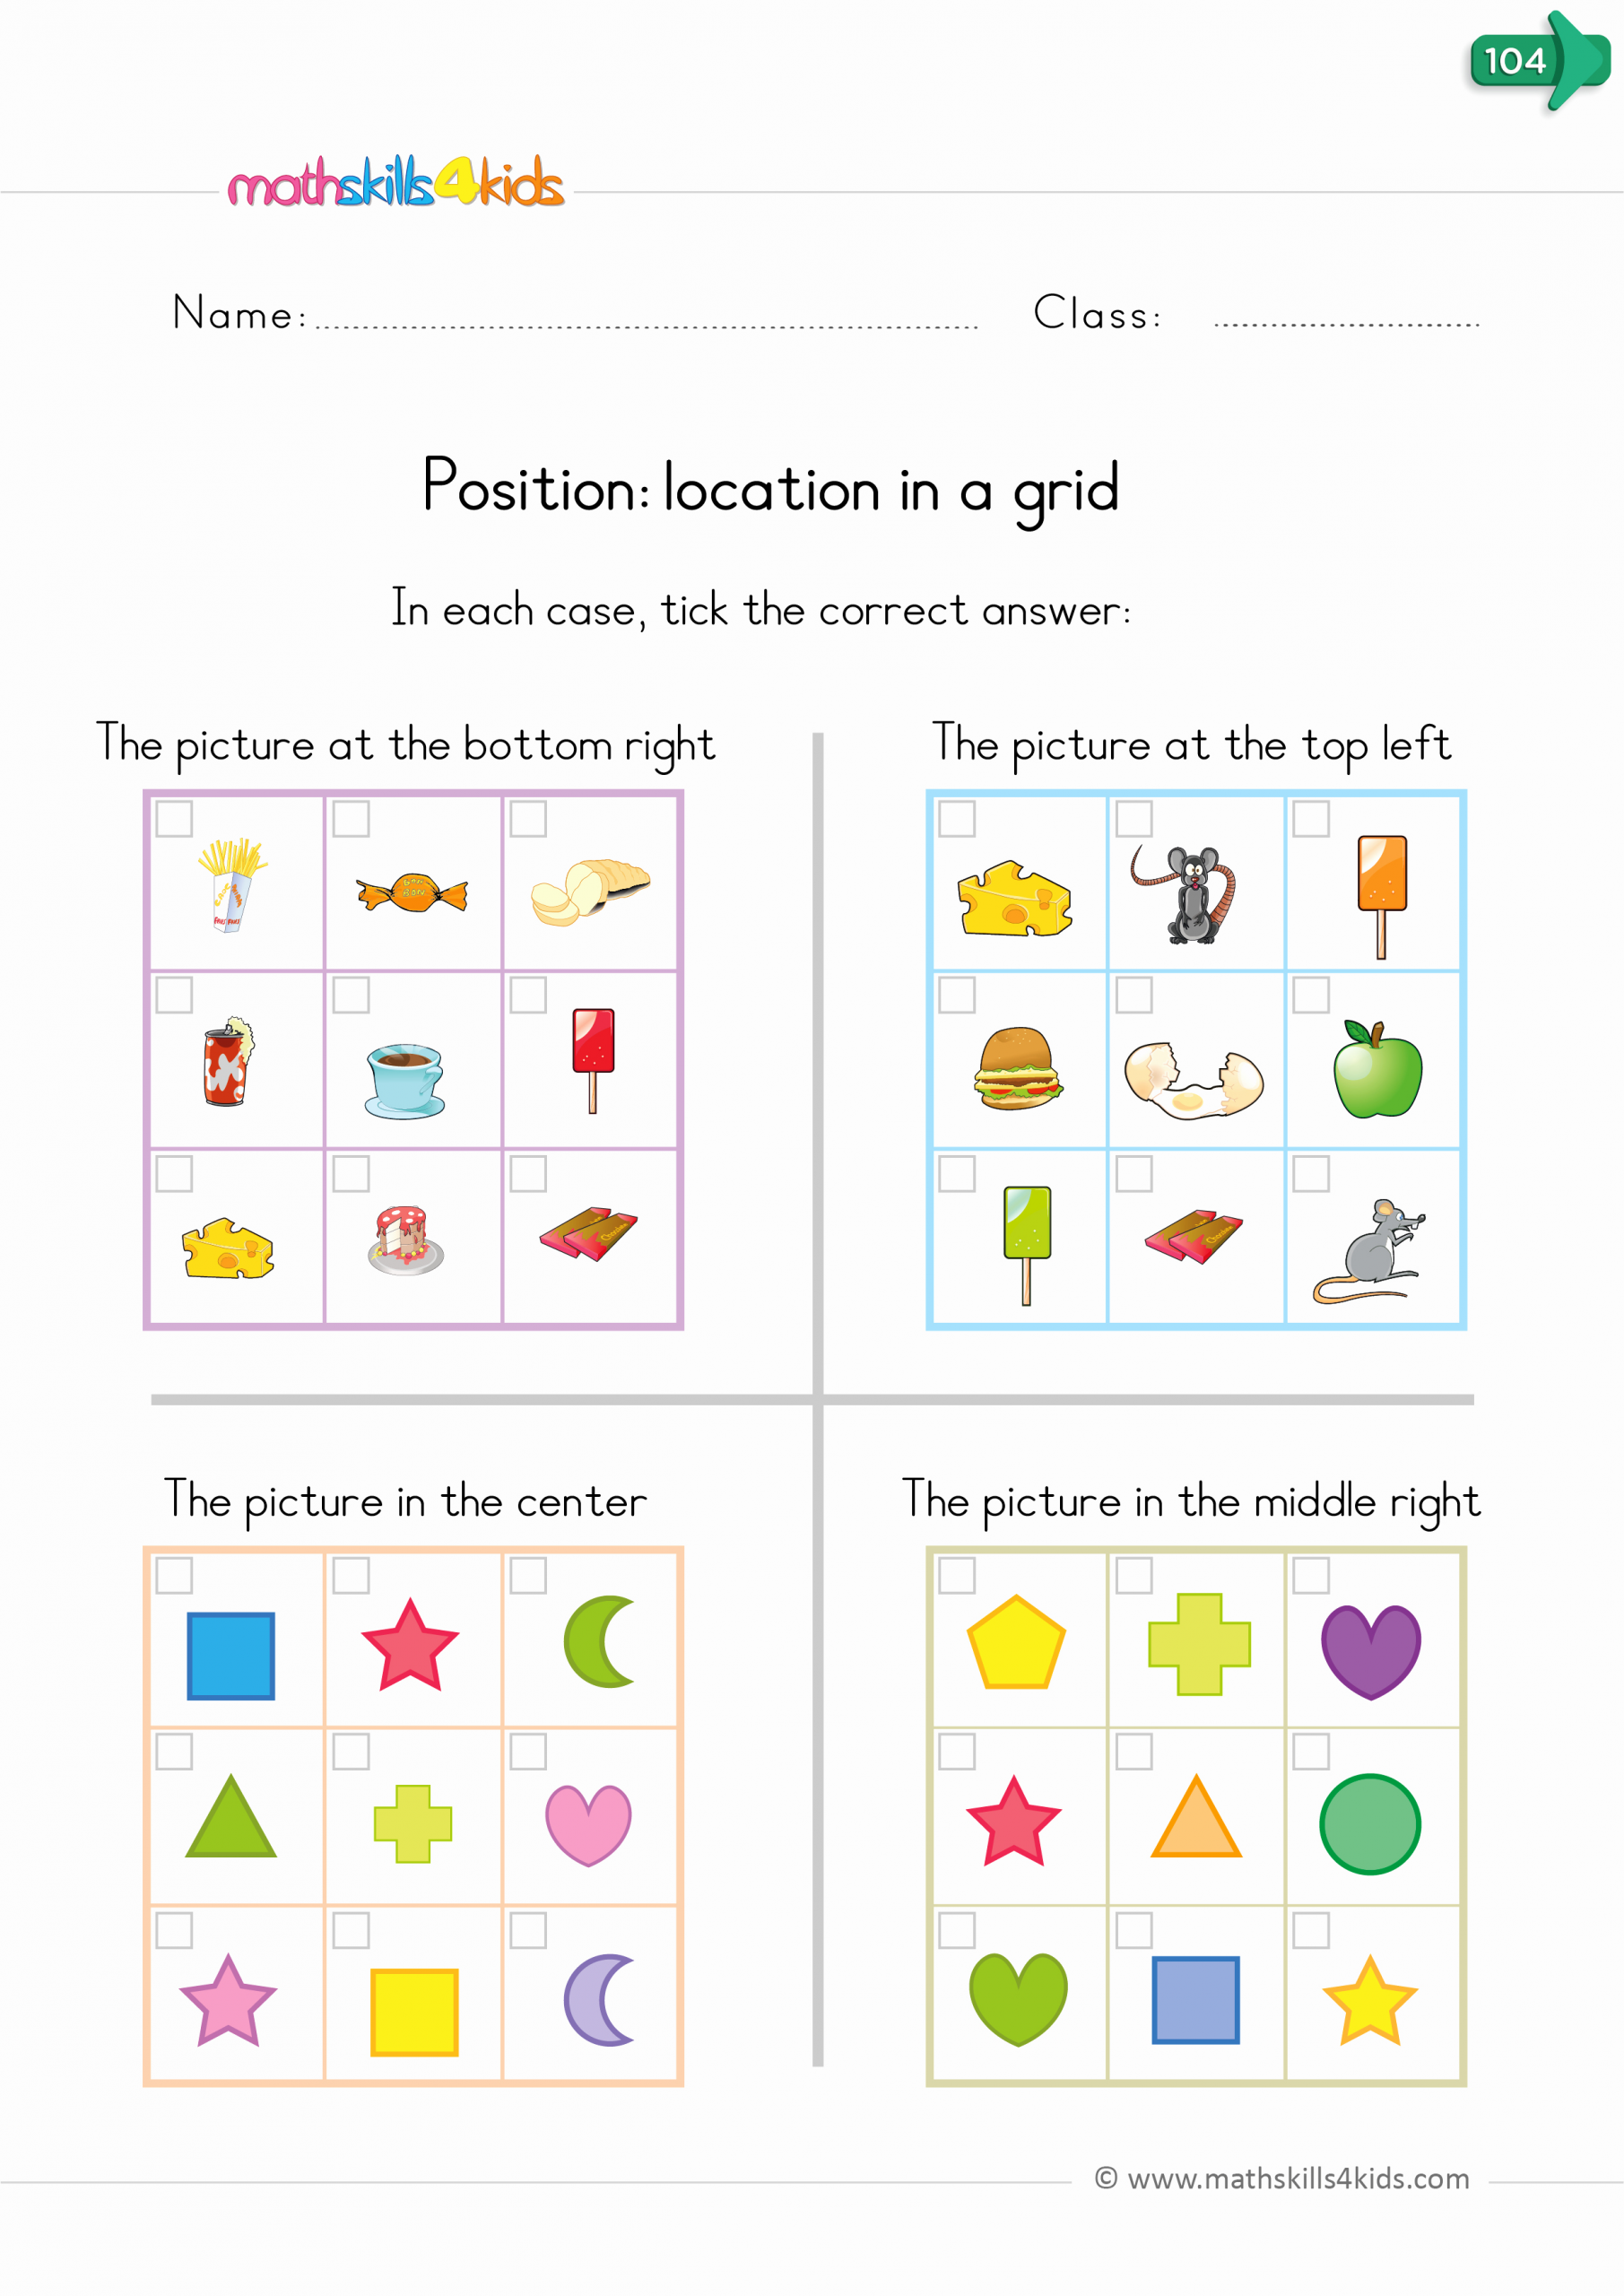 Positional Words Worksheets for Preschool Luxury Position Worksheets for Kindergarten